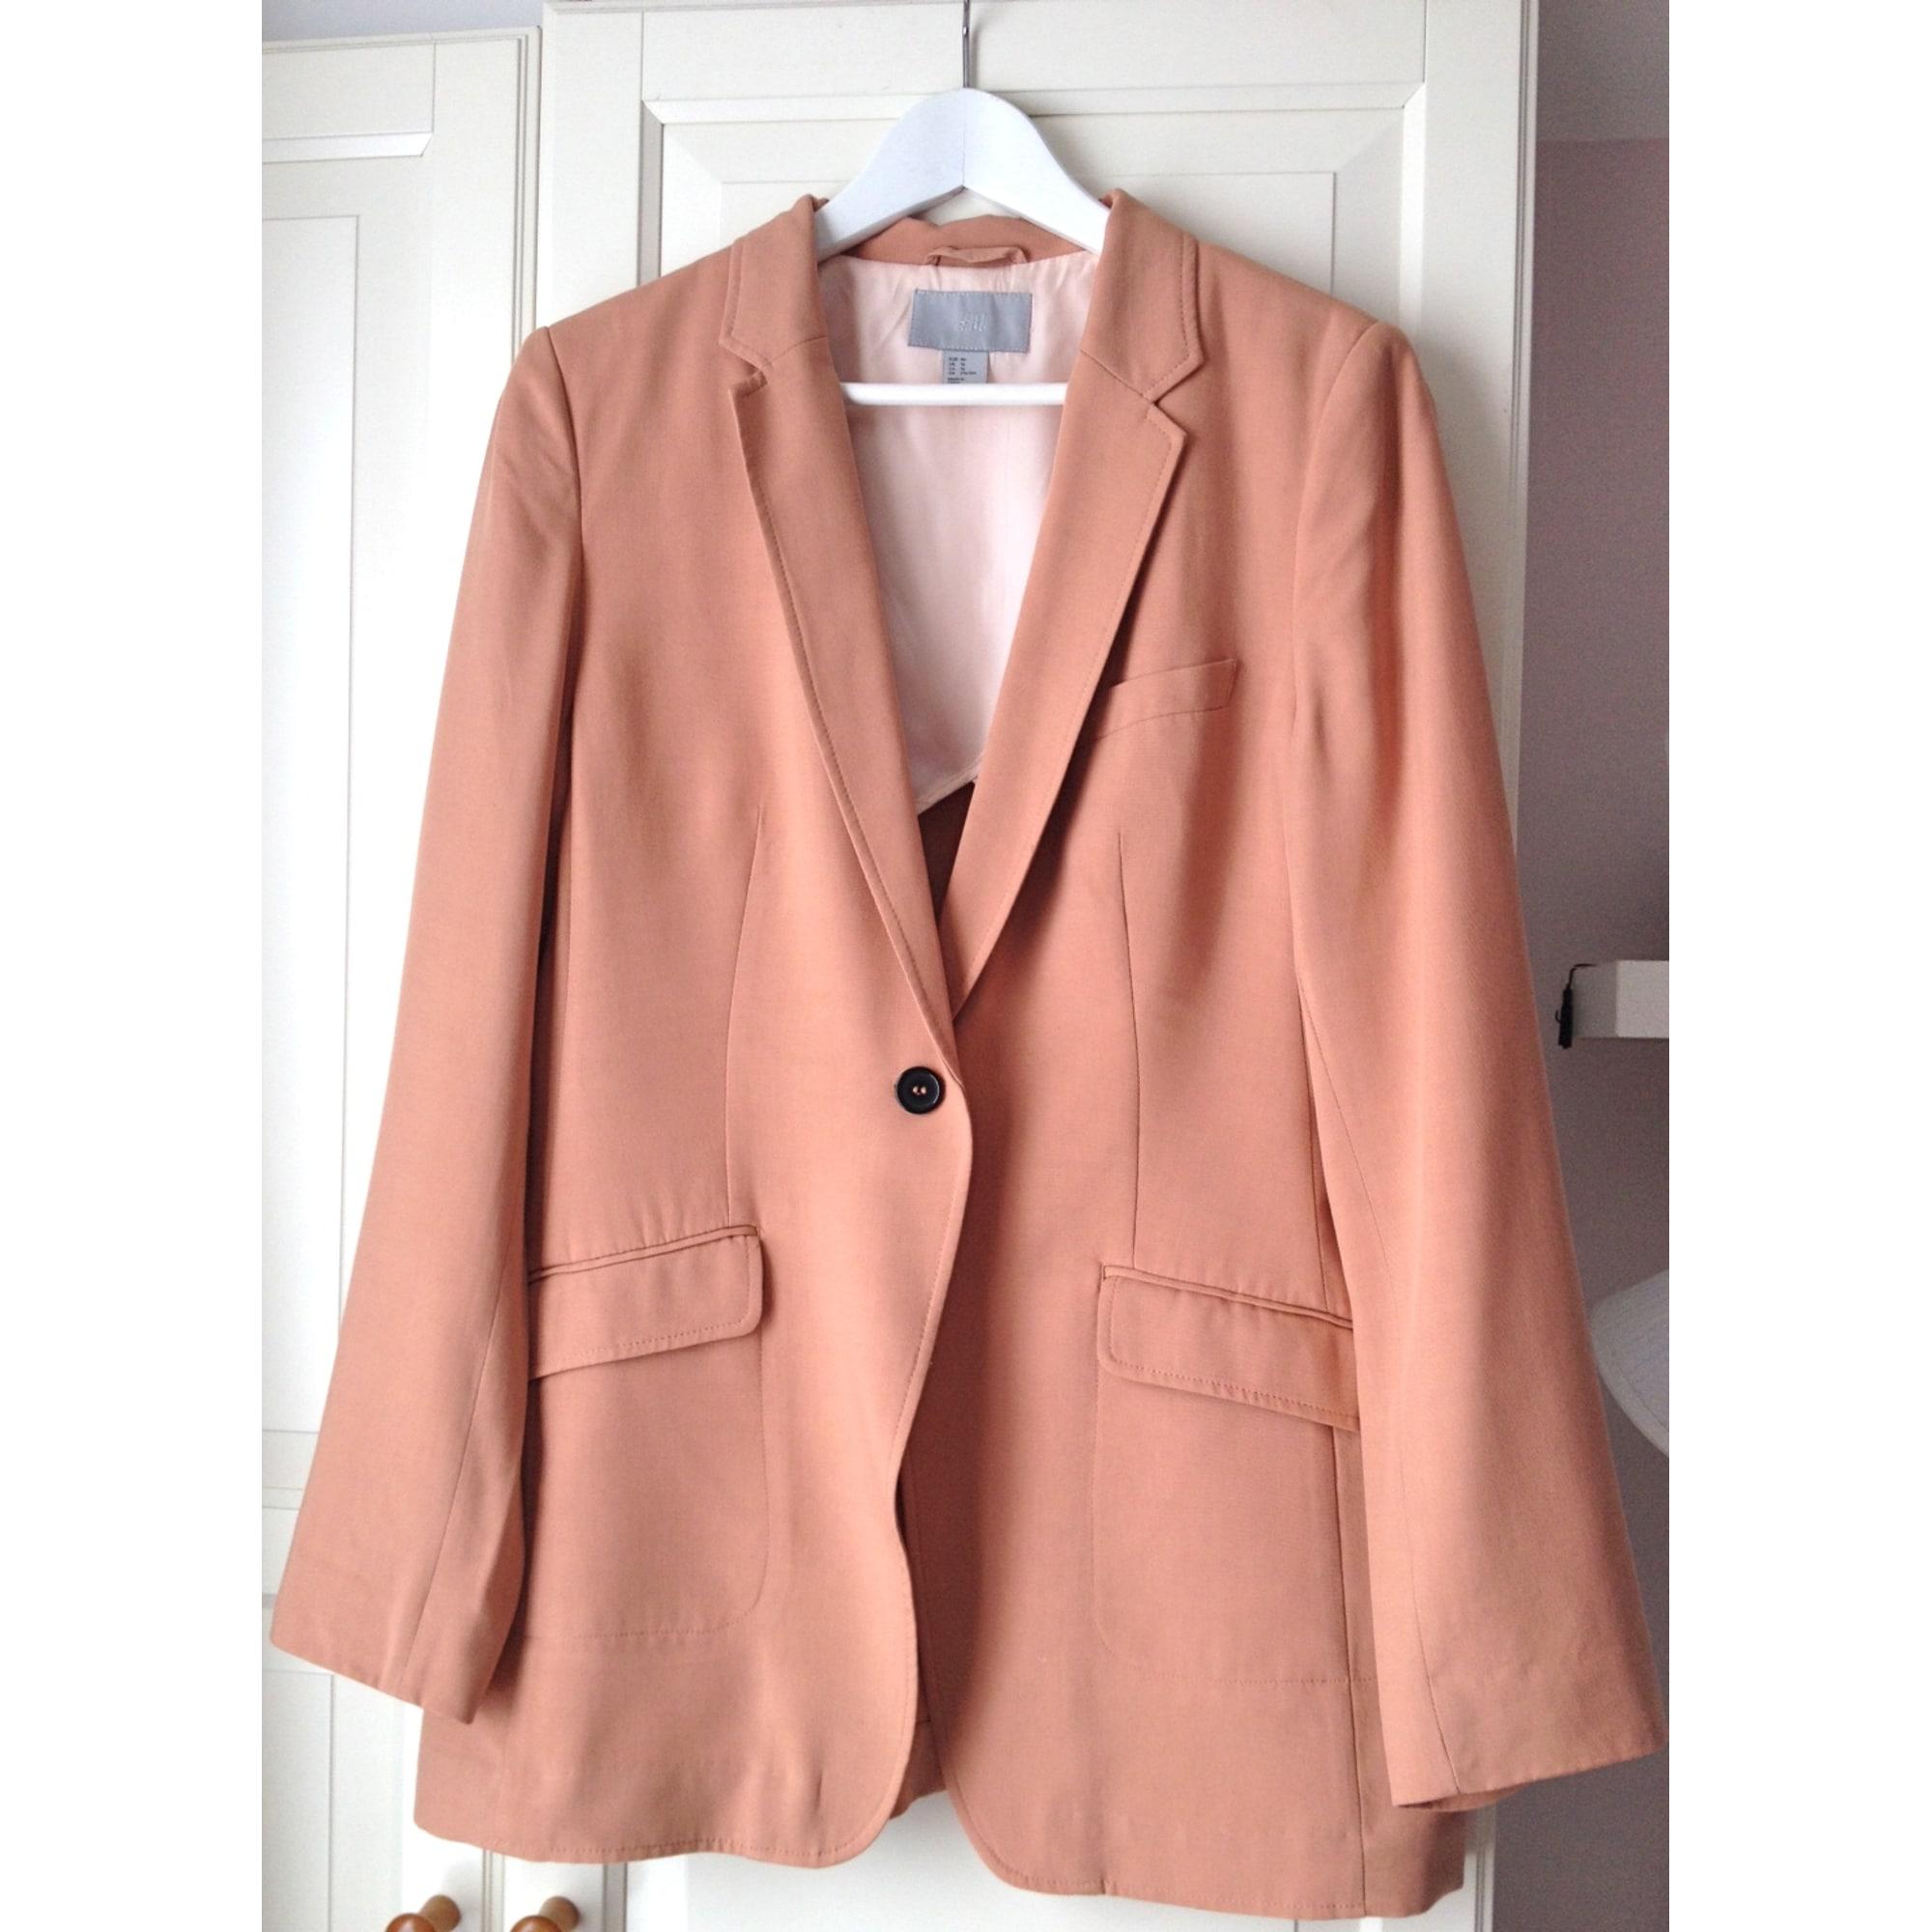 Blazer, veste tailleur H&M 46 (XXL) saumon orangé 2179968